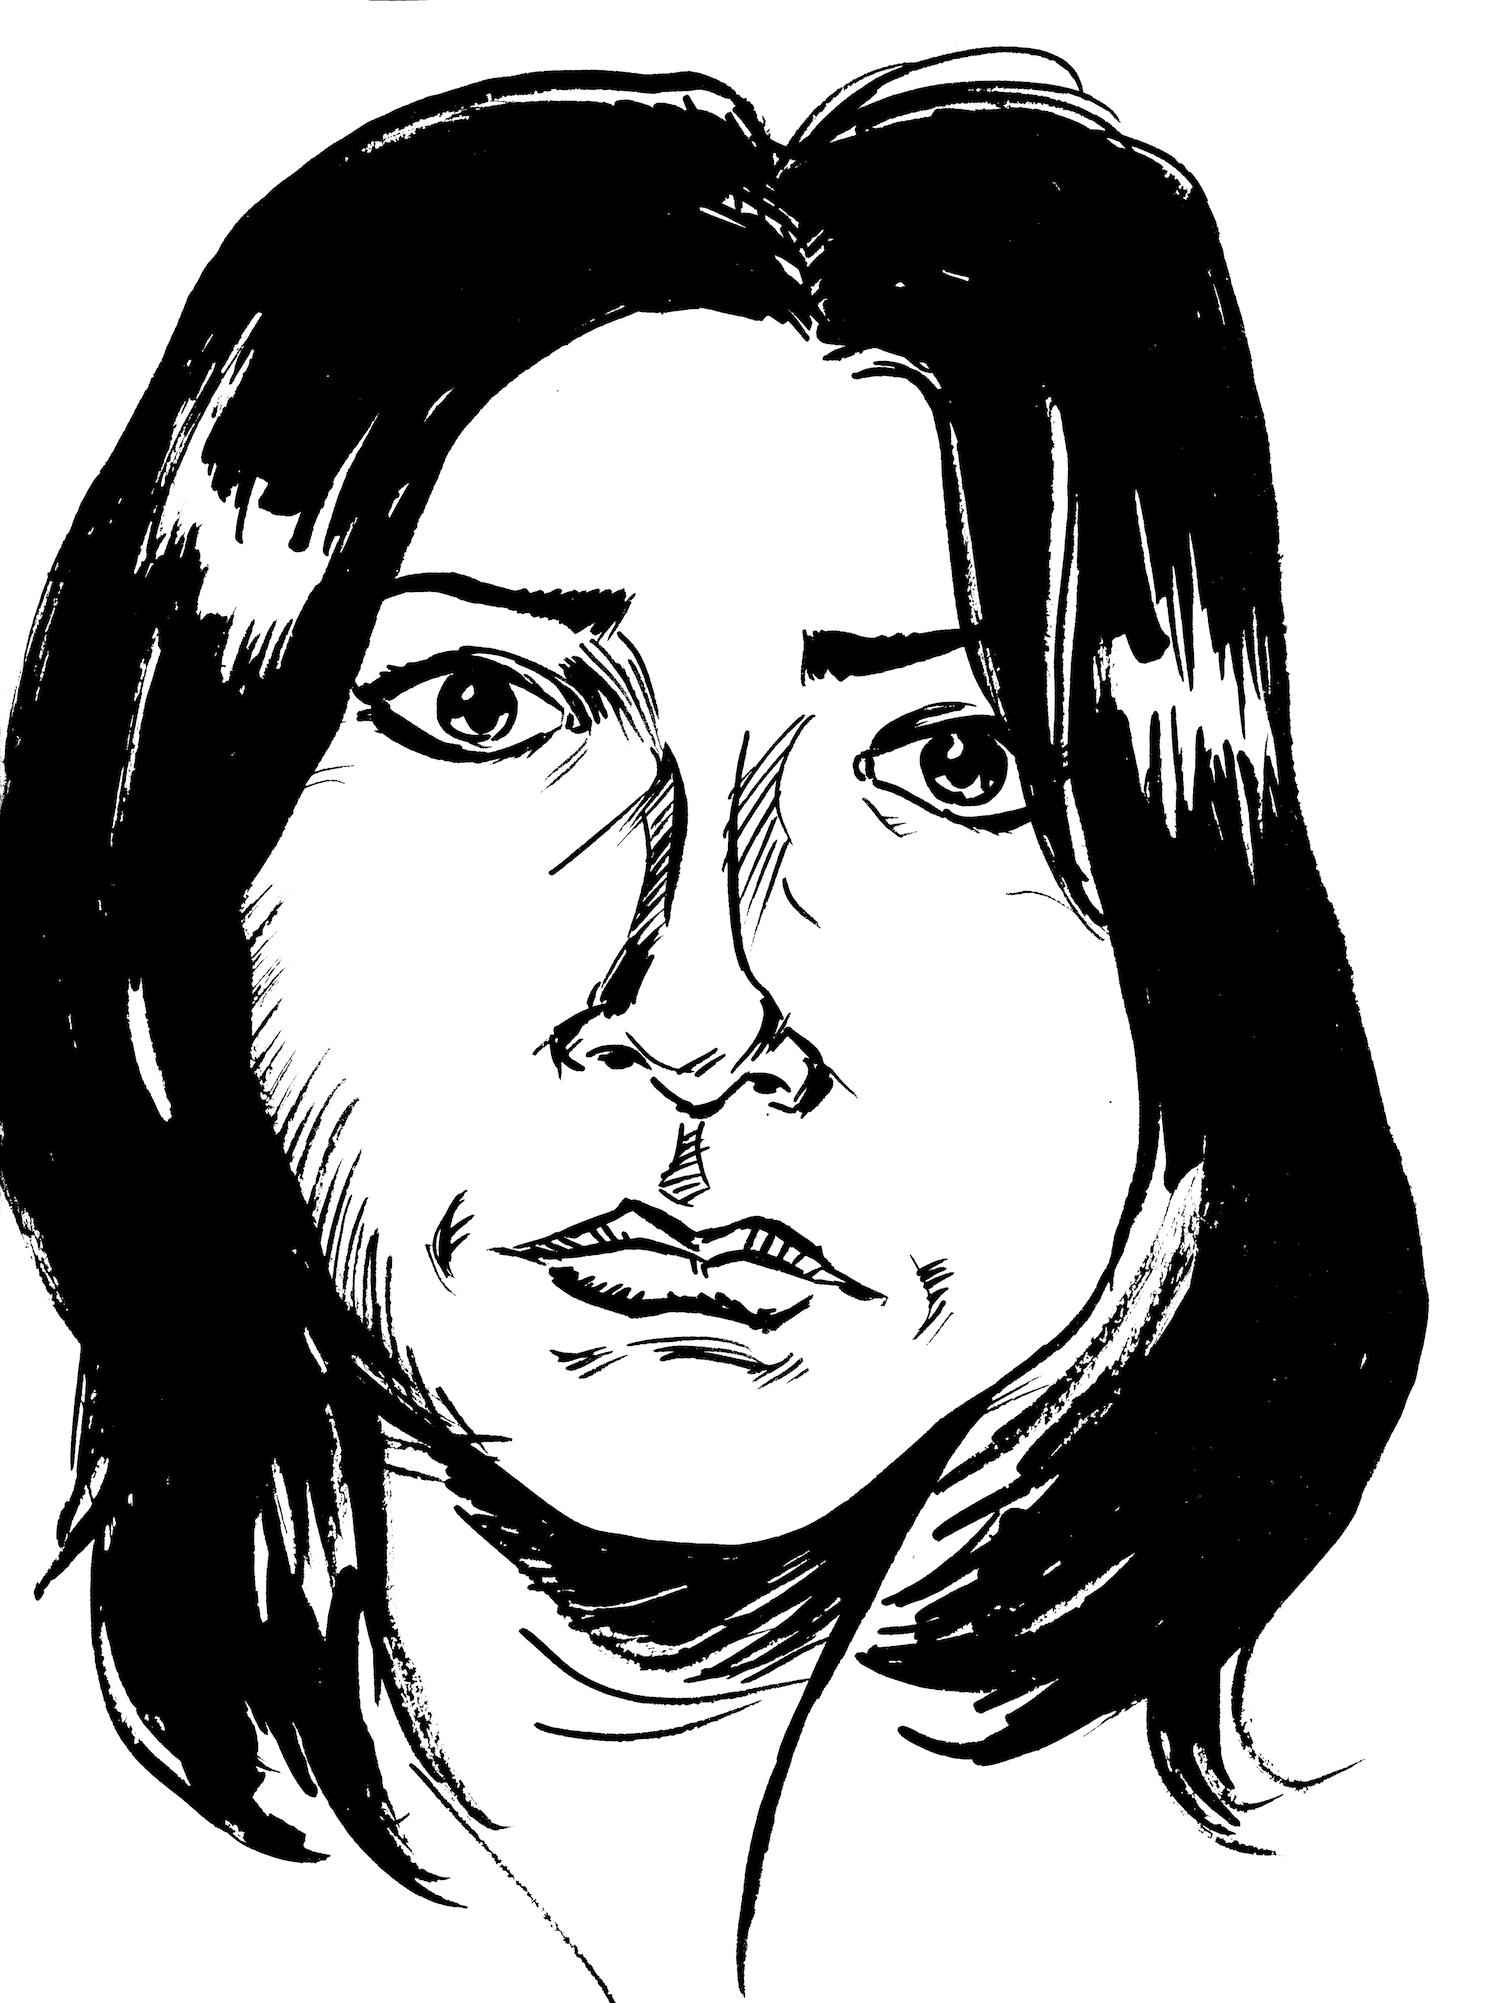 Illustration of Elaine Frieda Alook by Evan Munday